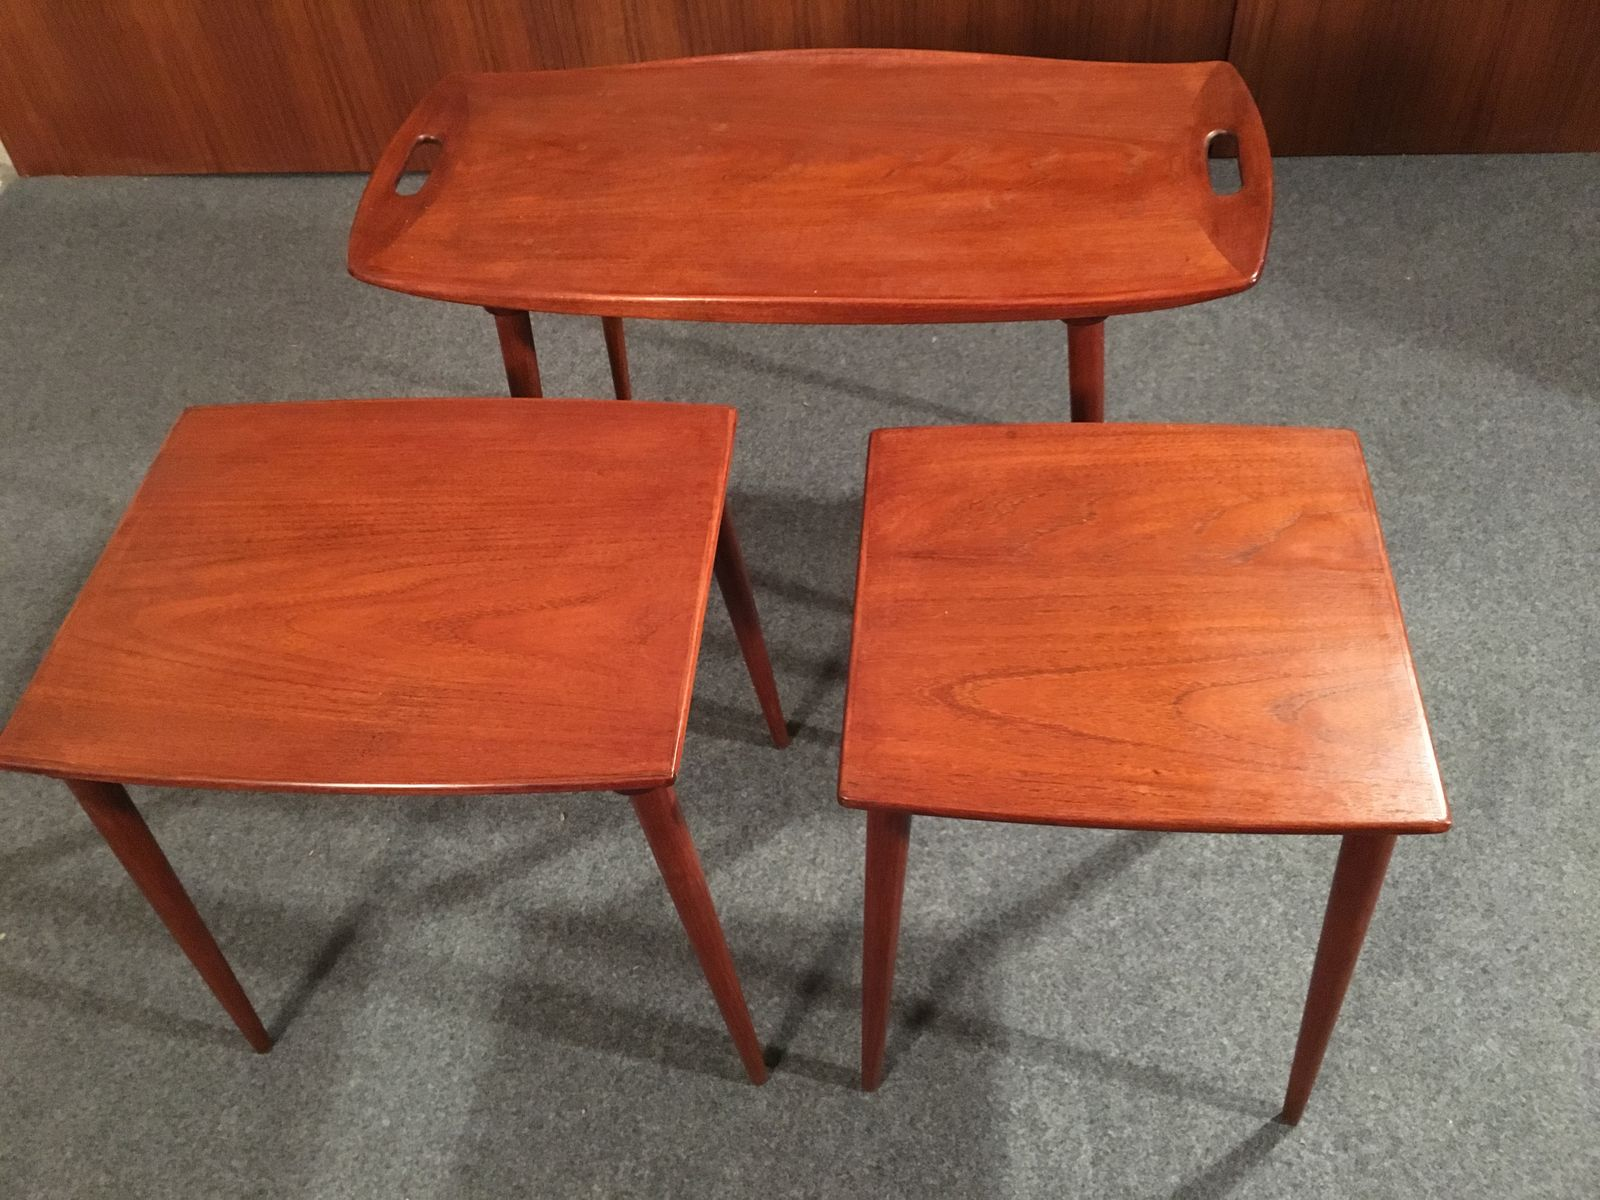 tables gigognes vintage par jens quistgaard en vente sur pamono. Black Bedroom Furniture Sets. Home Design Ideas